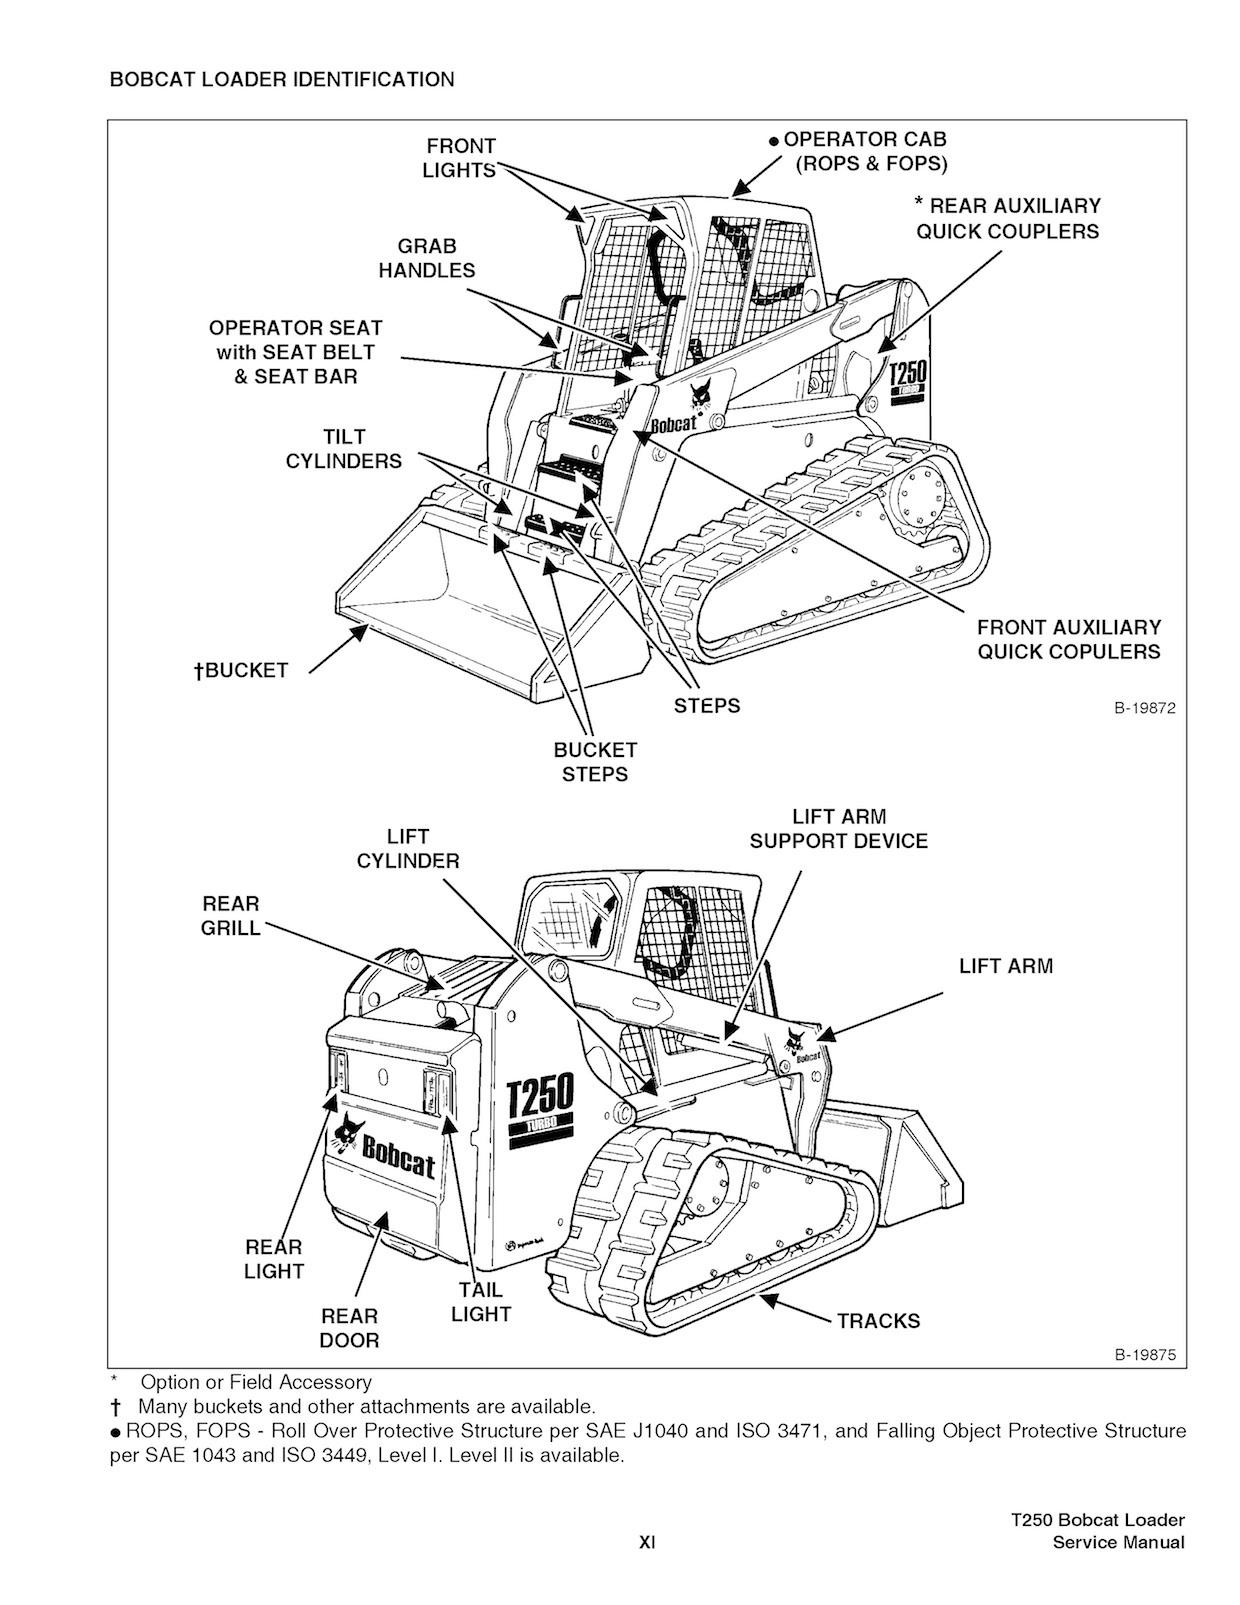 bobcat t250 parts diagram wiring diagram used bobcat t 250 parts catalog bobcat t250 parts diagram [ 1240 x 1605 Pixel ]